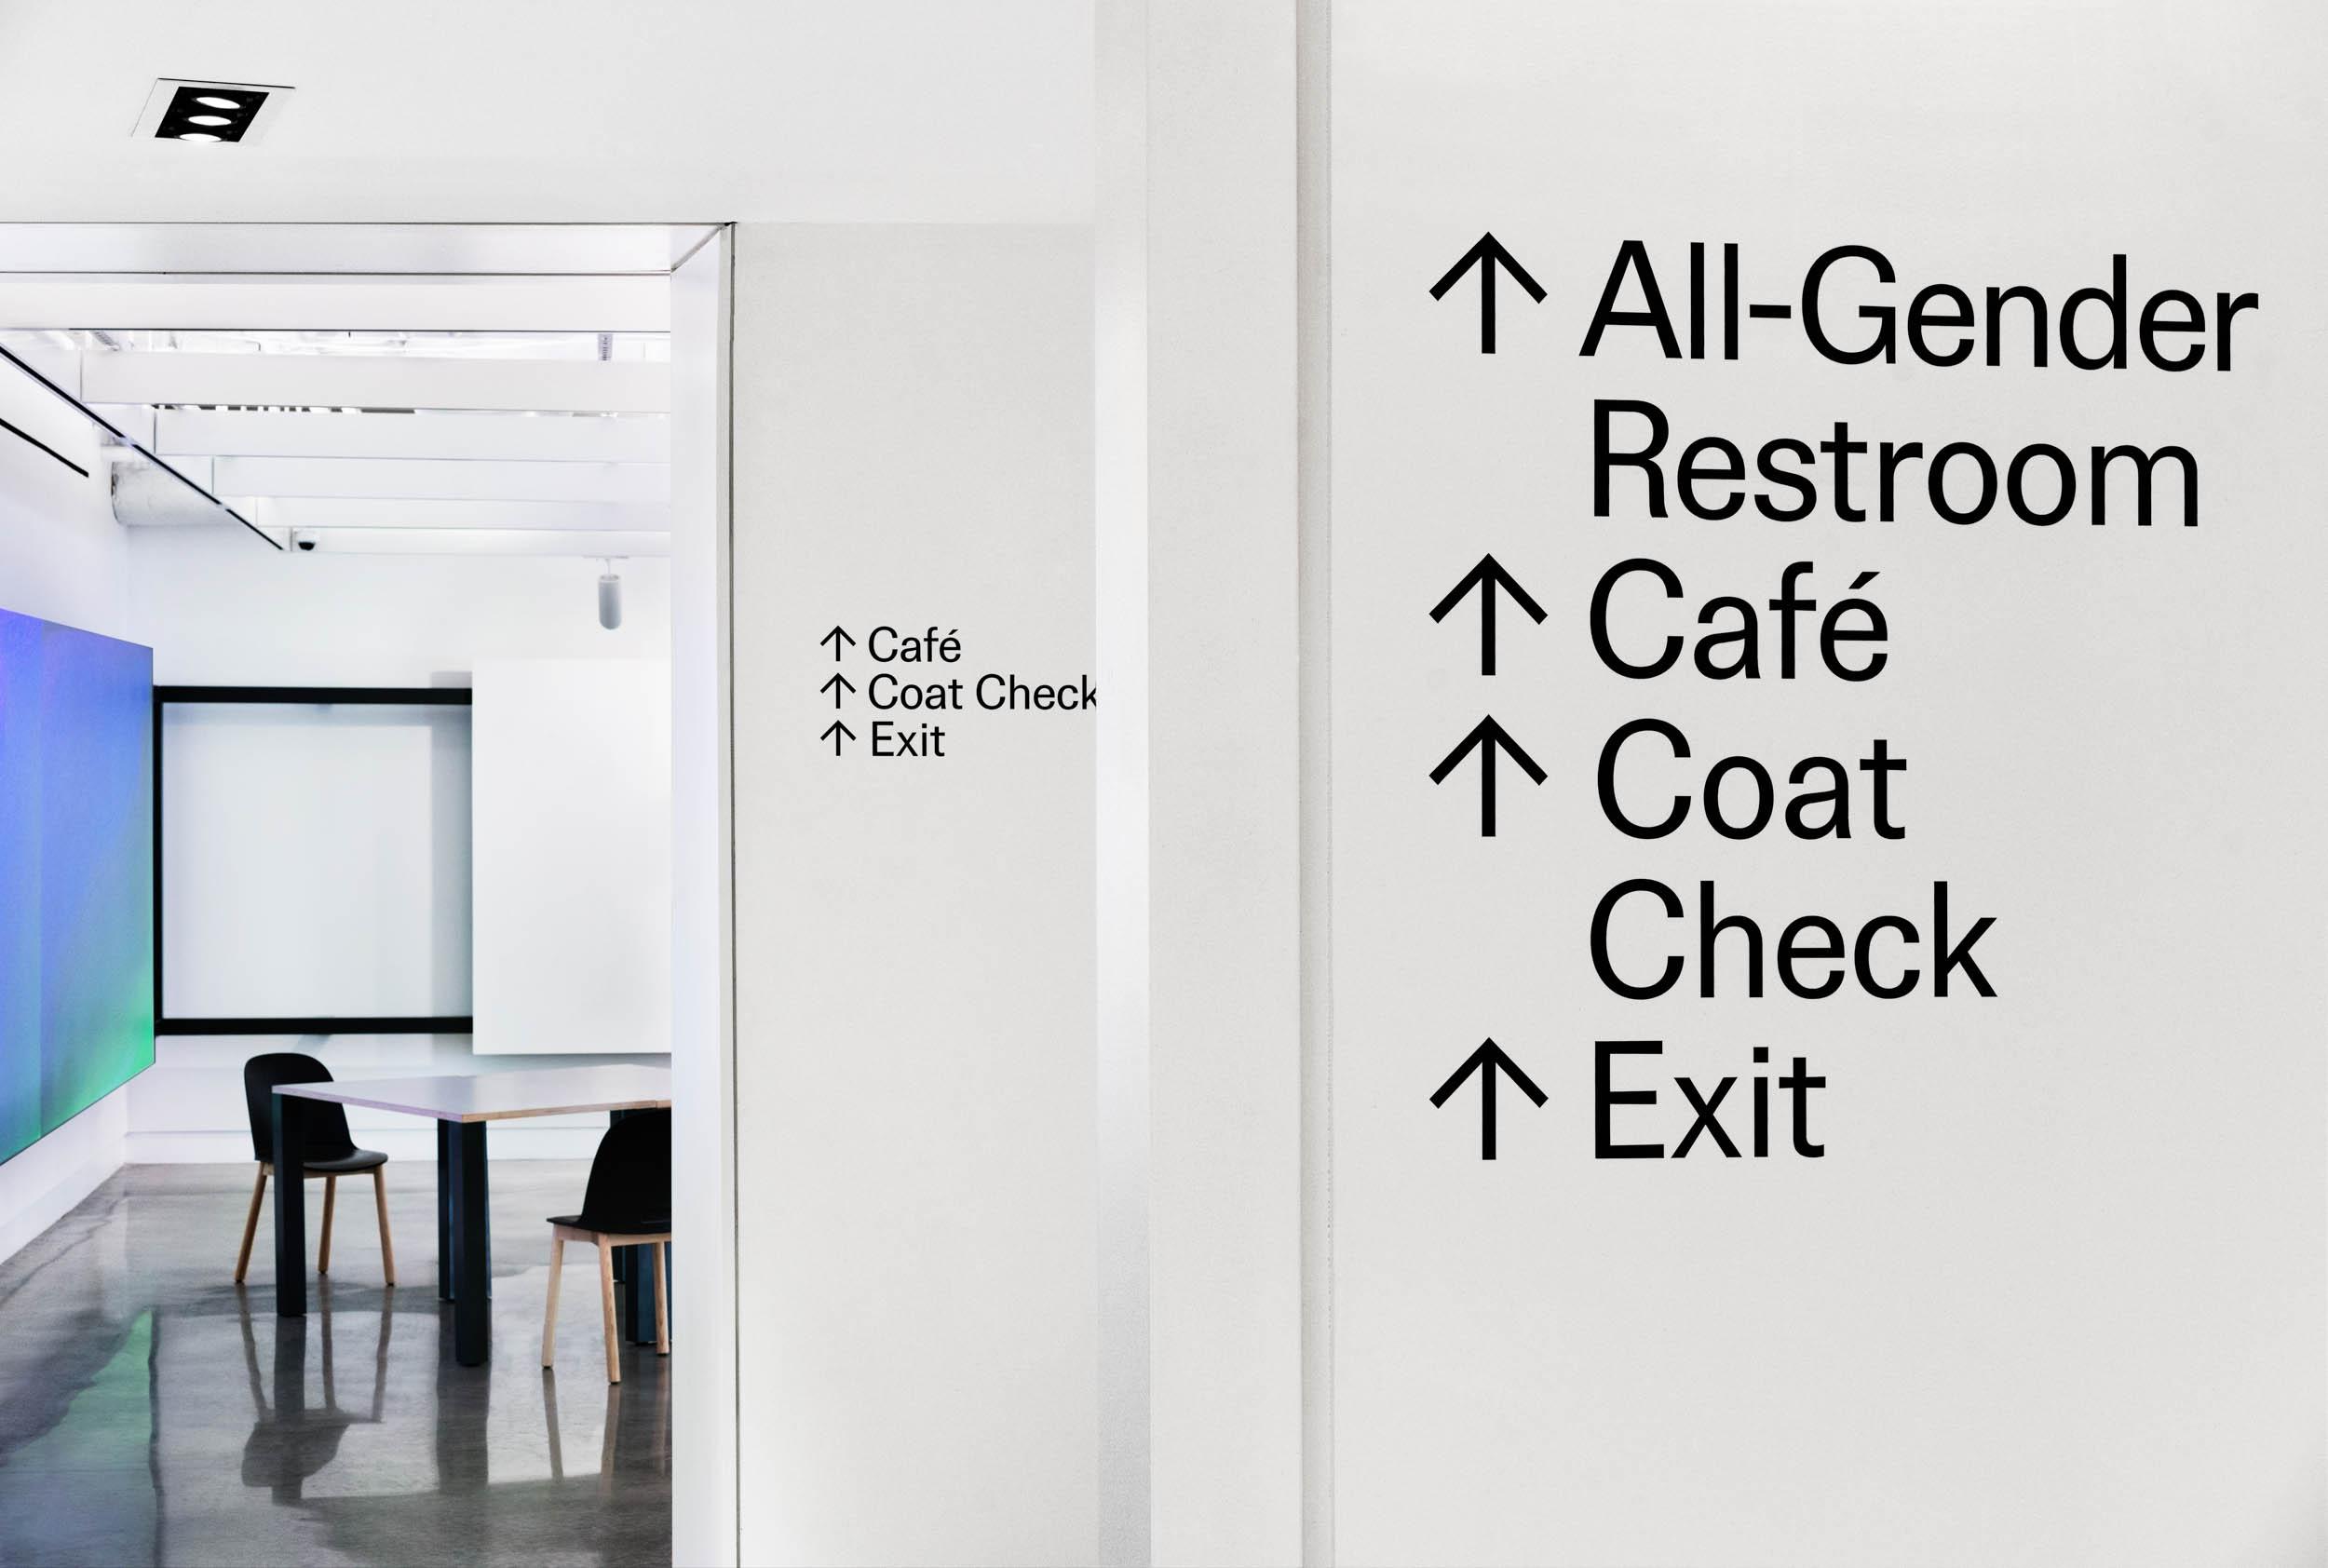 Location: New York, NY   Client:  C    ommon Room